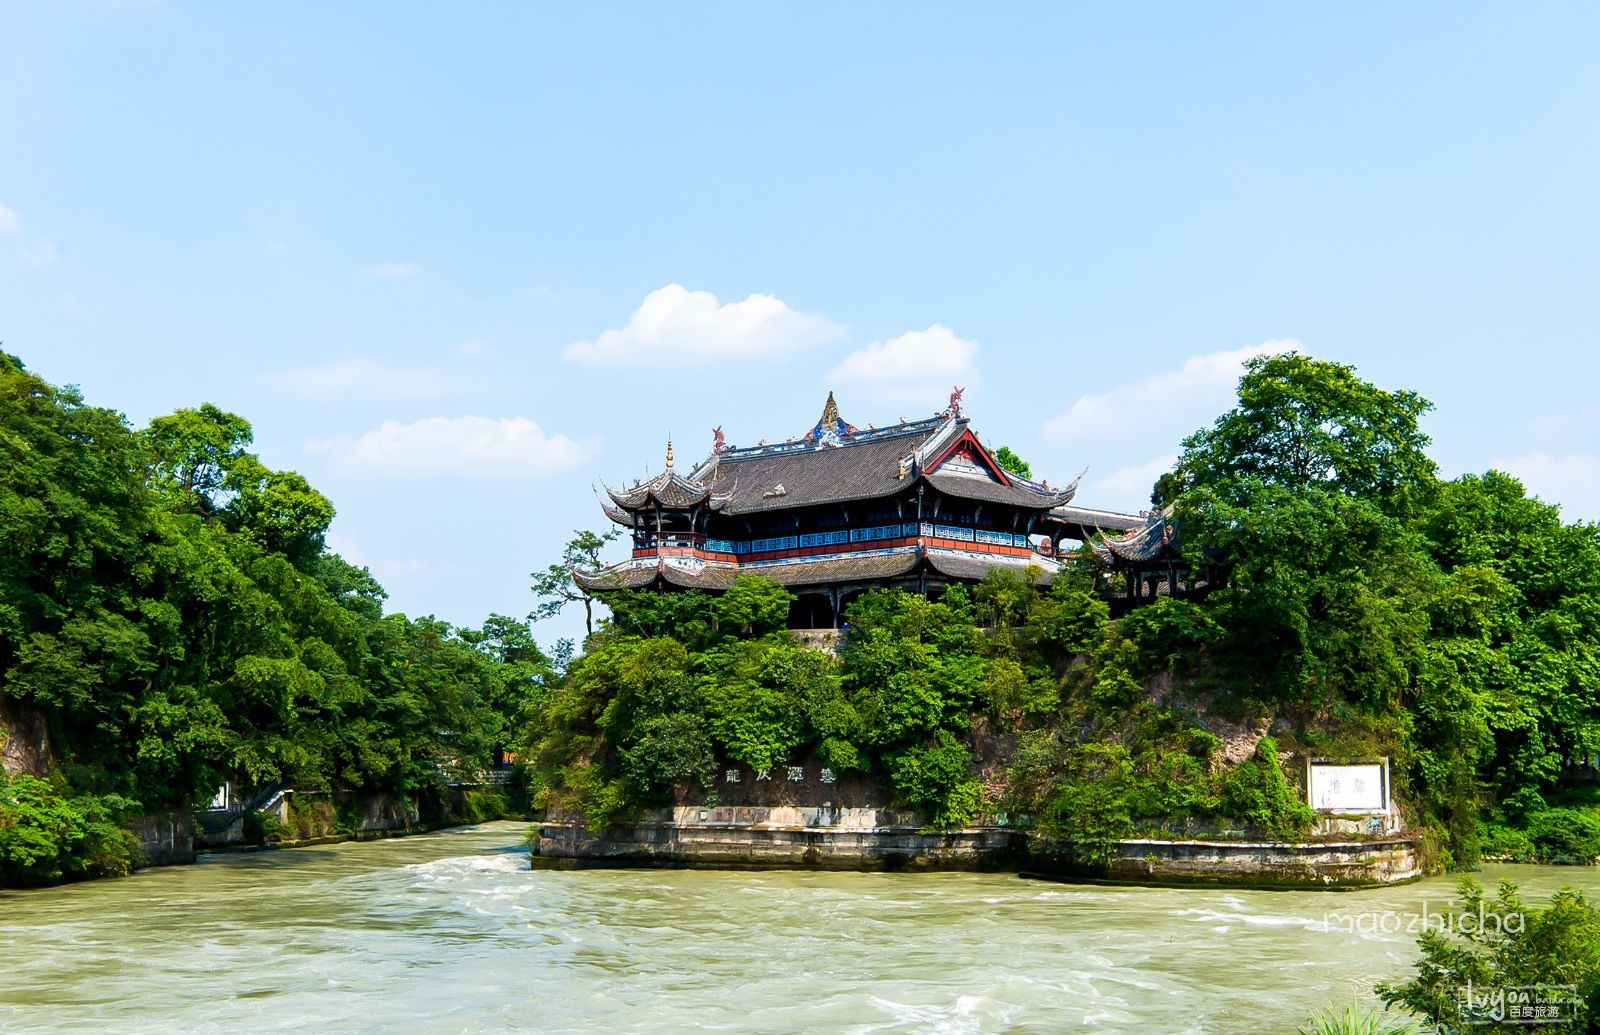 ChengDu Dujiangyan Irrigation System Tour